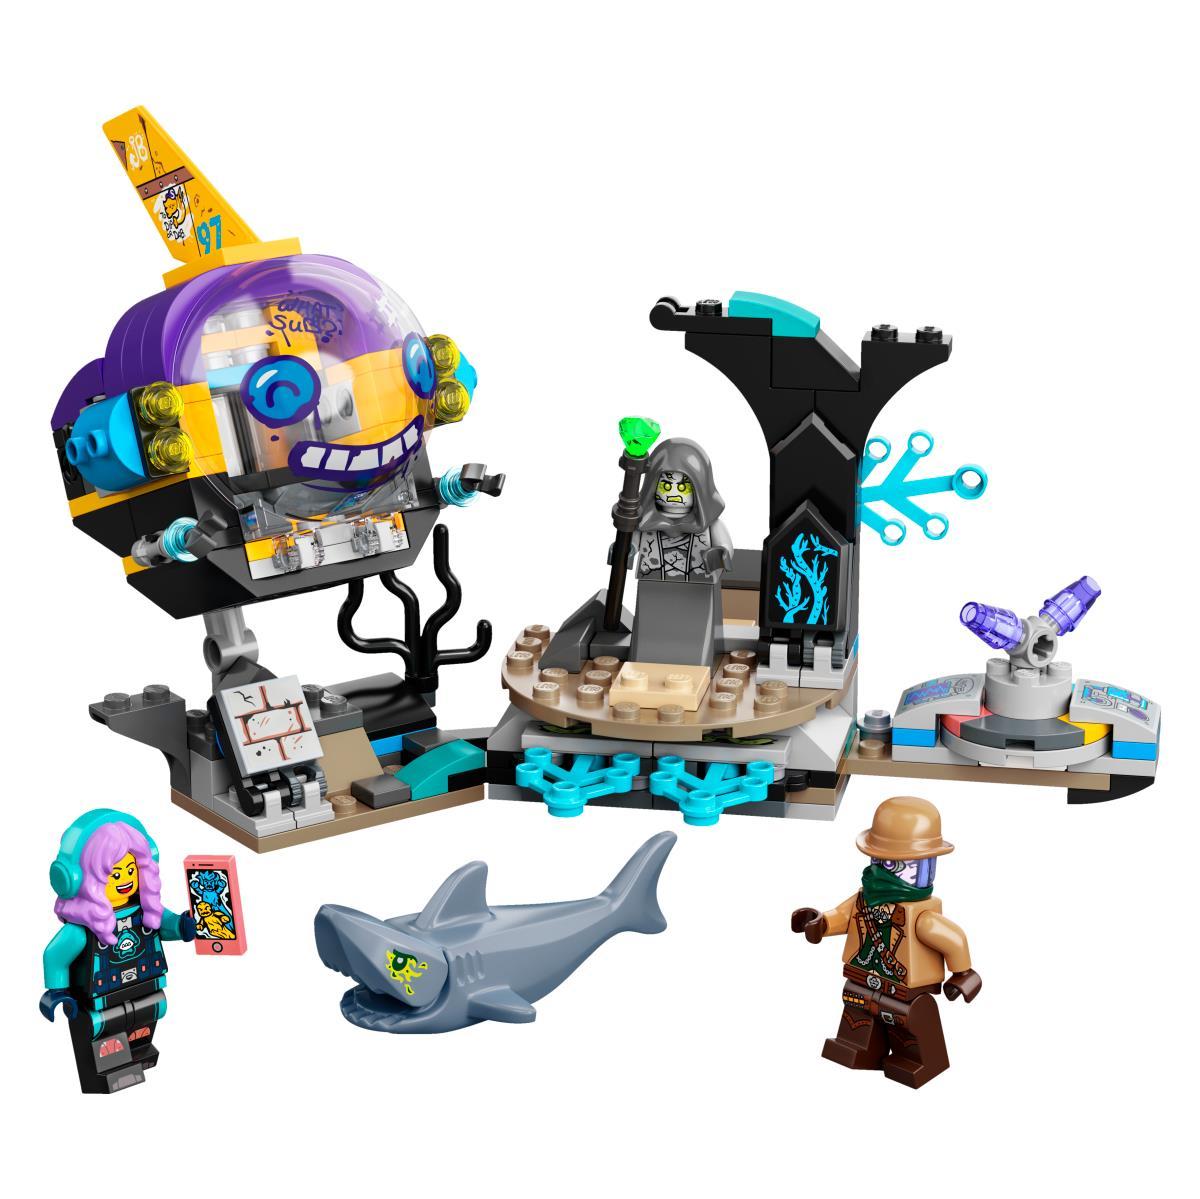 lego-hidden-side-70433-j-b-s-ubat (1)